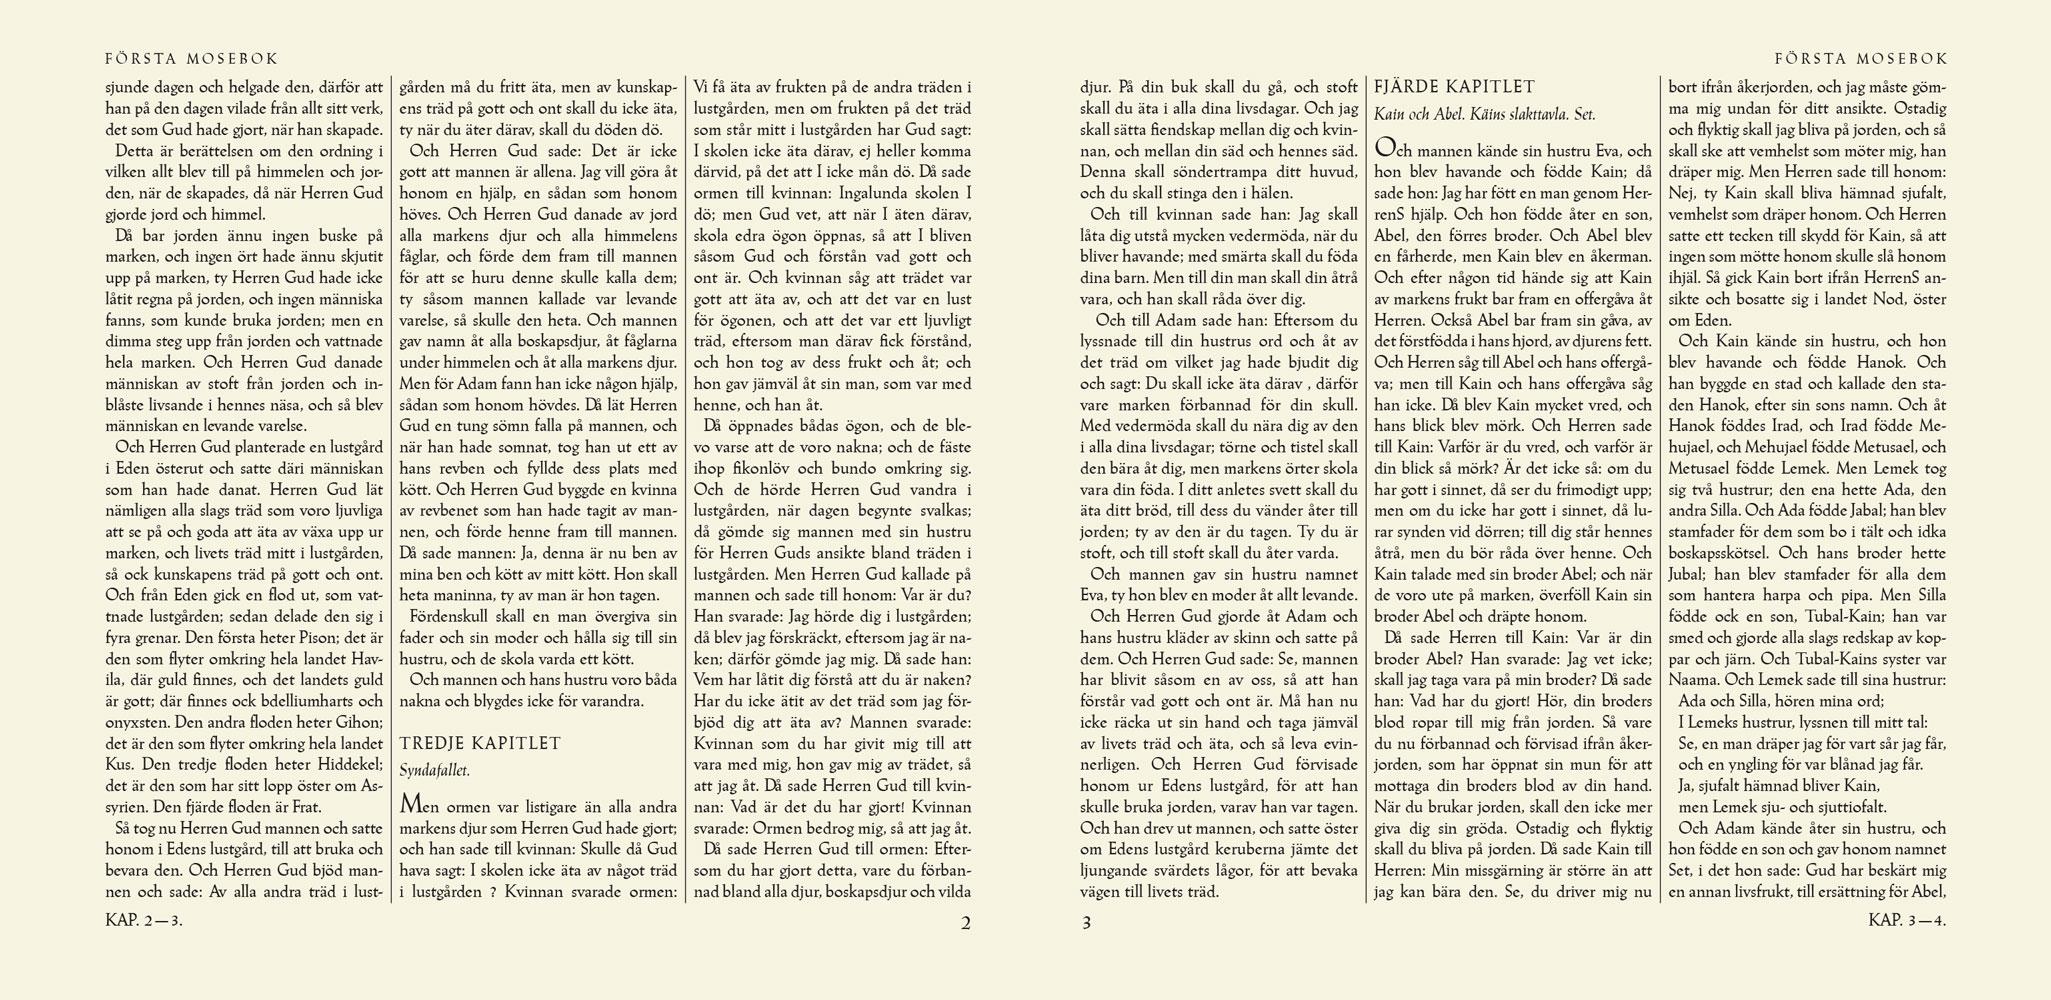 ANDERS BILLOW  Stockholm, Sweden, 1955  Trajanus  19.5 X 20 cm  Letterpress  Liber Librorum Collection